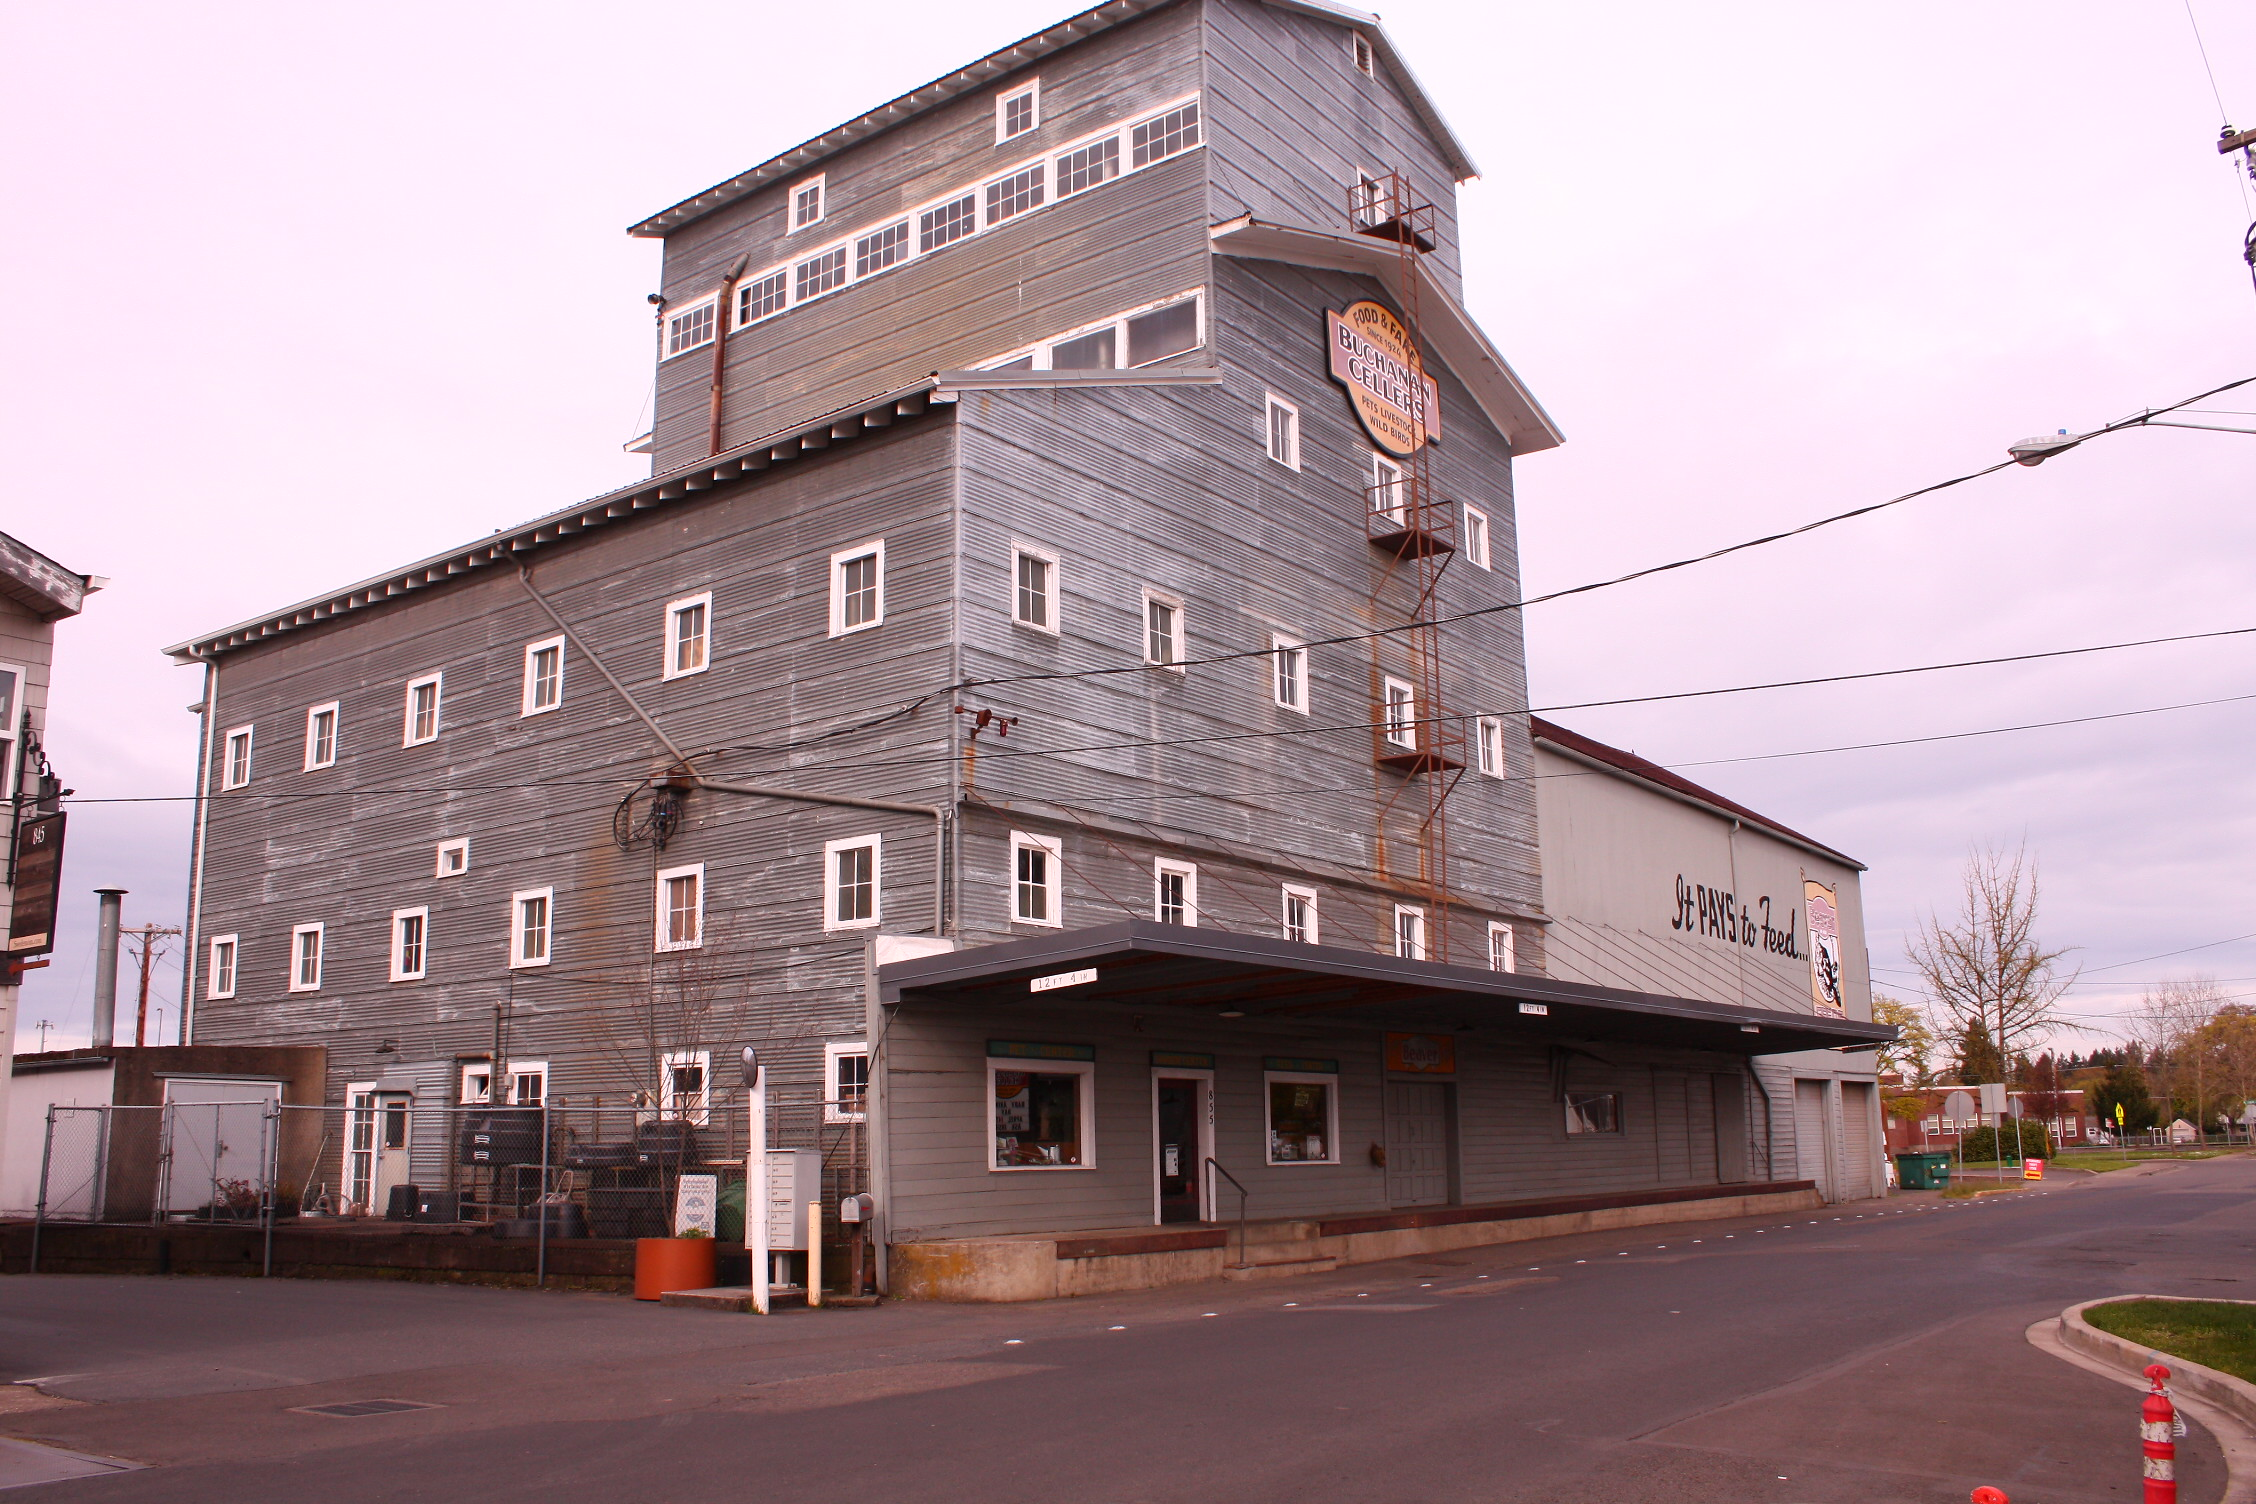 Historic Buchanan Cellers building